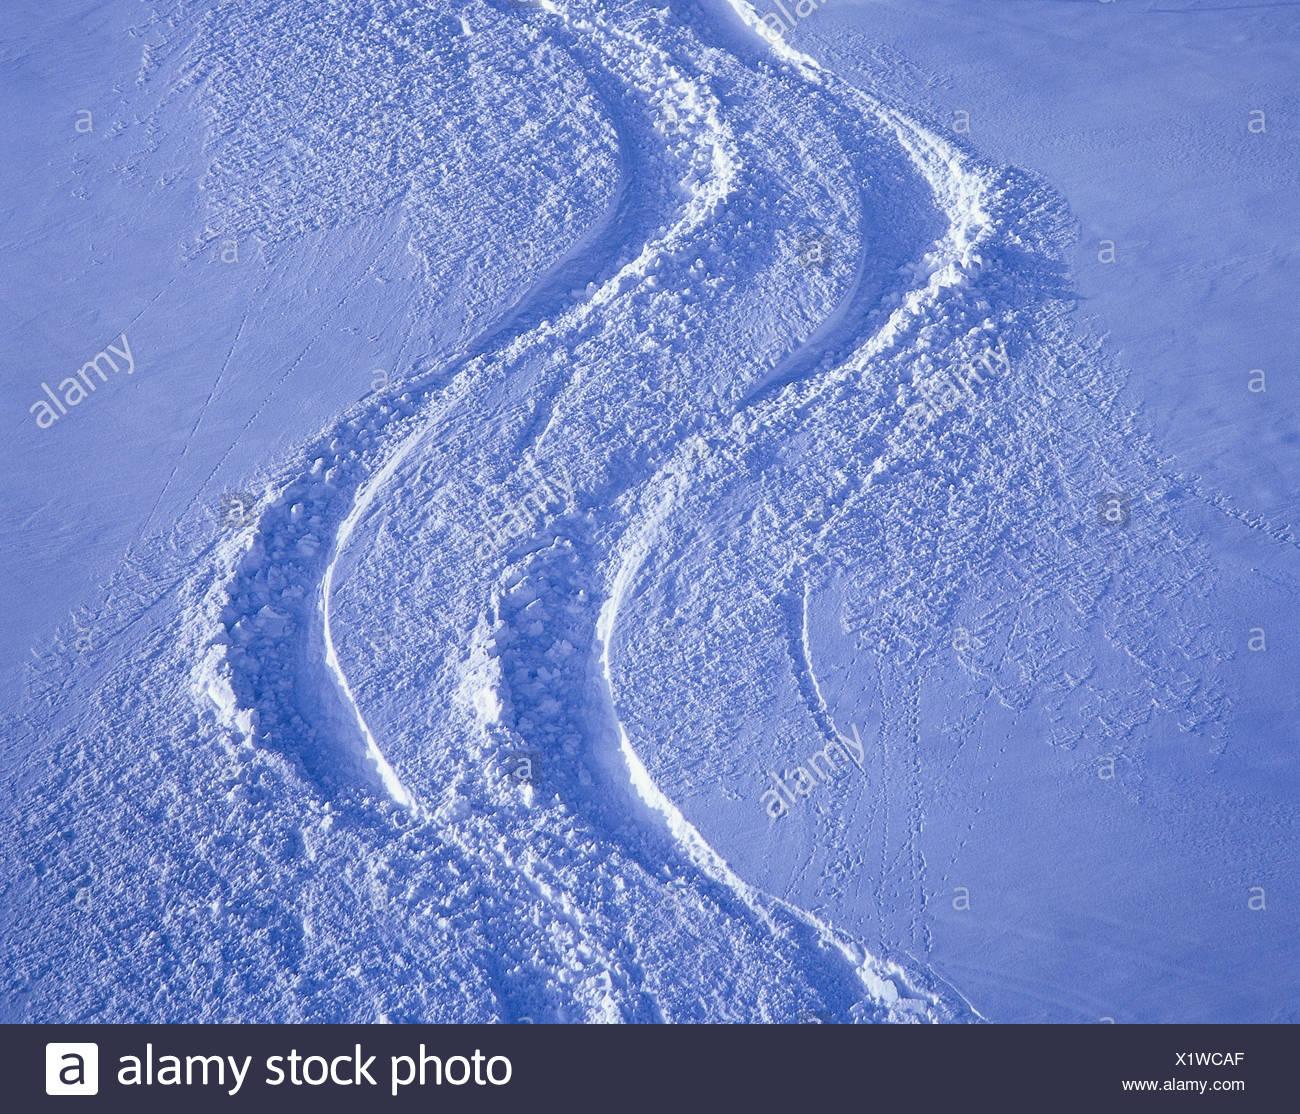 Snow inclination, ski tracks mountainside, snow, deep snow, sport, winter,